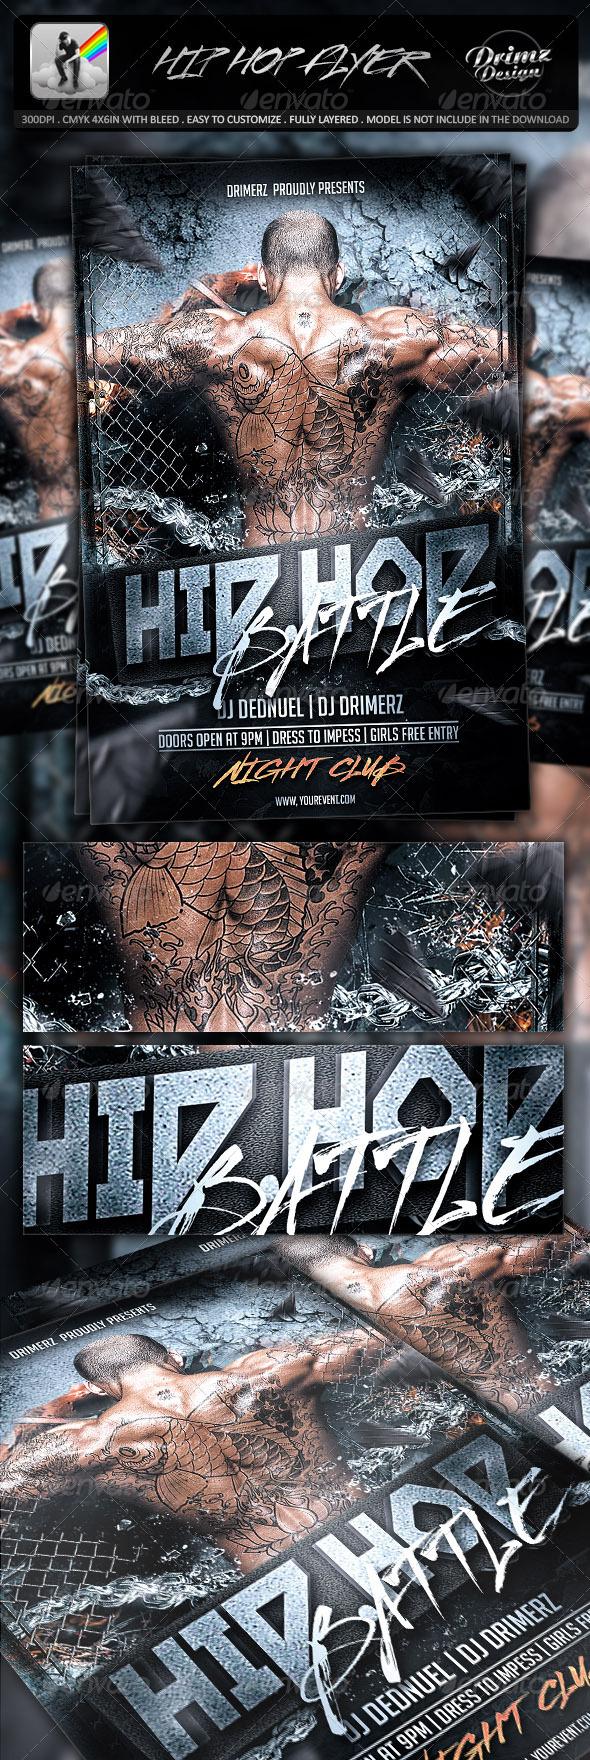 Hip Hop Flyer - Events Flyers